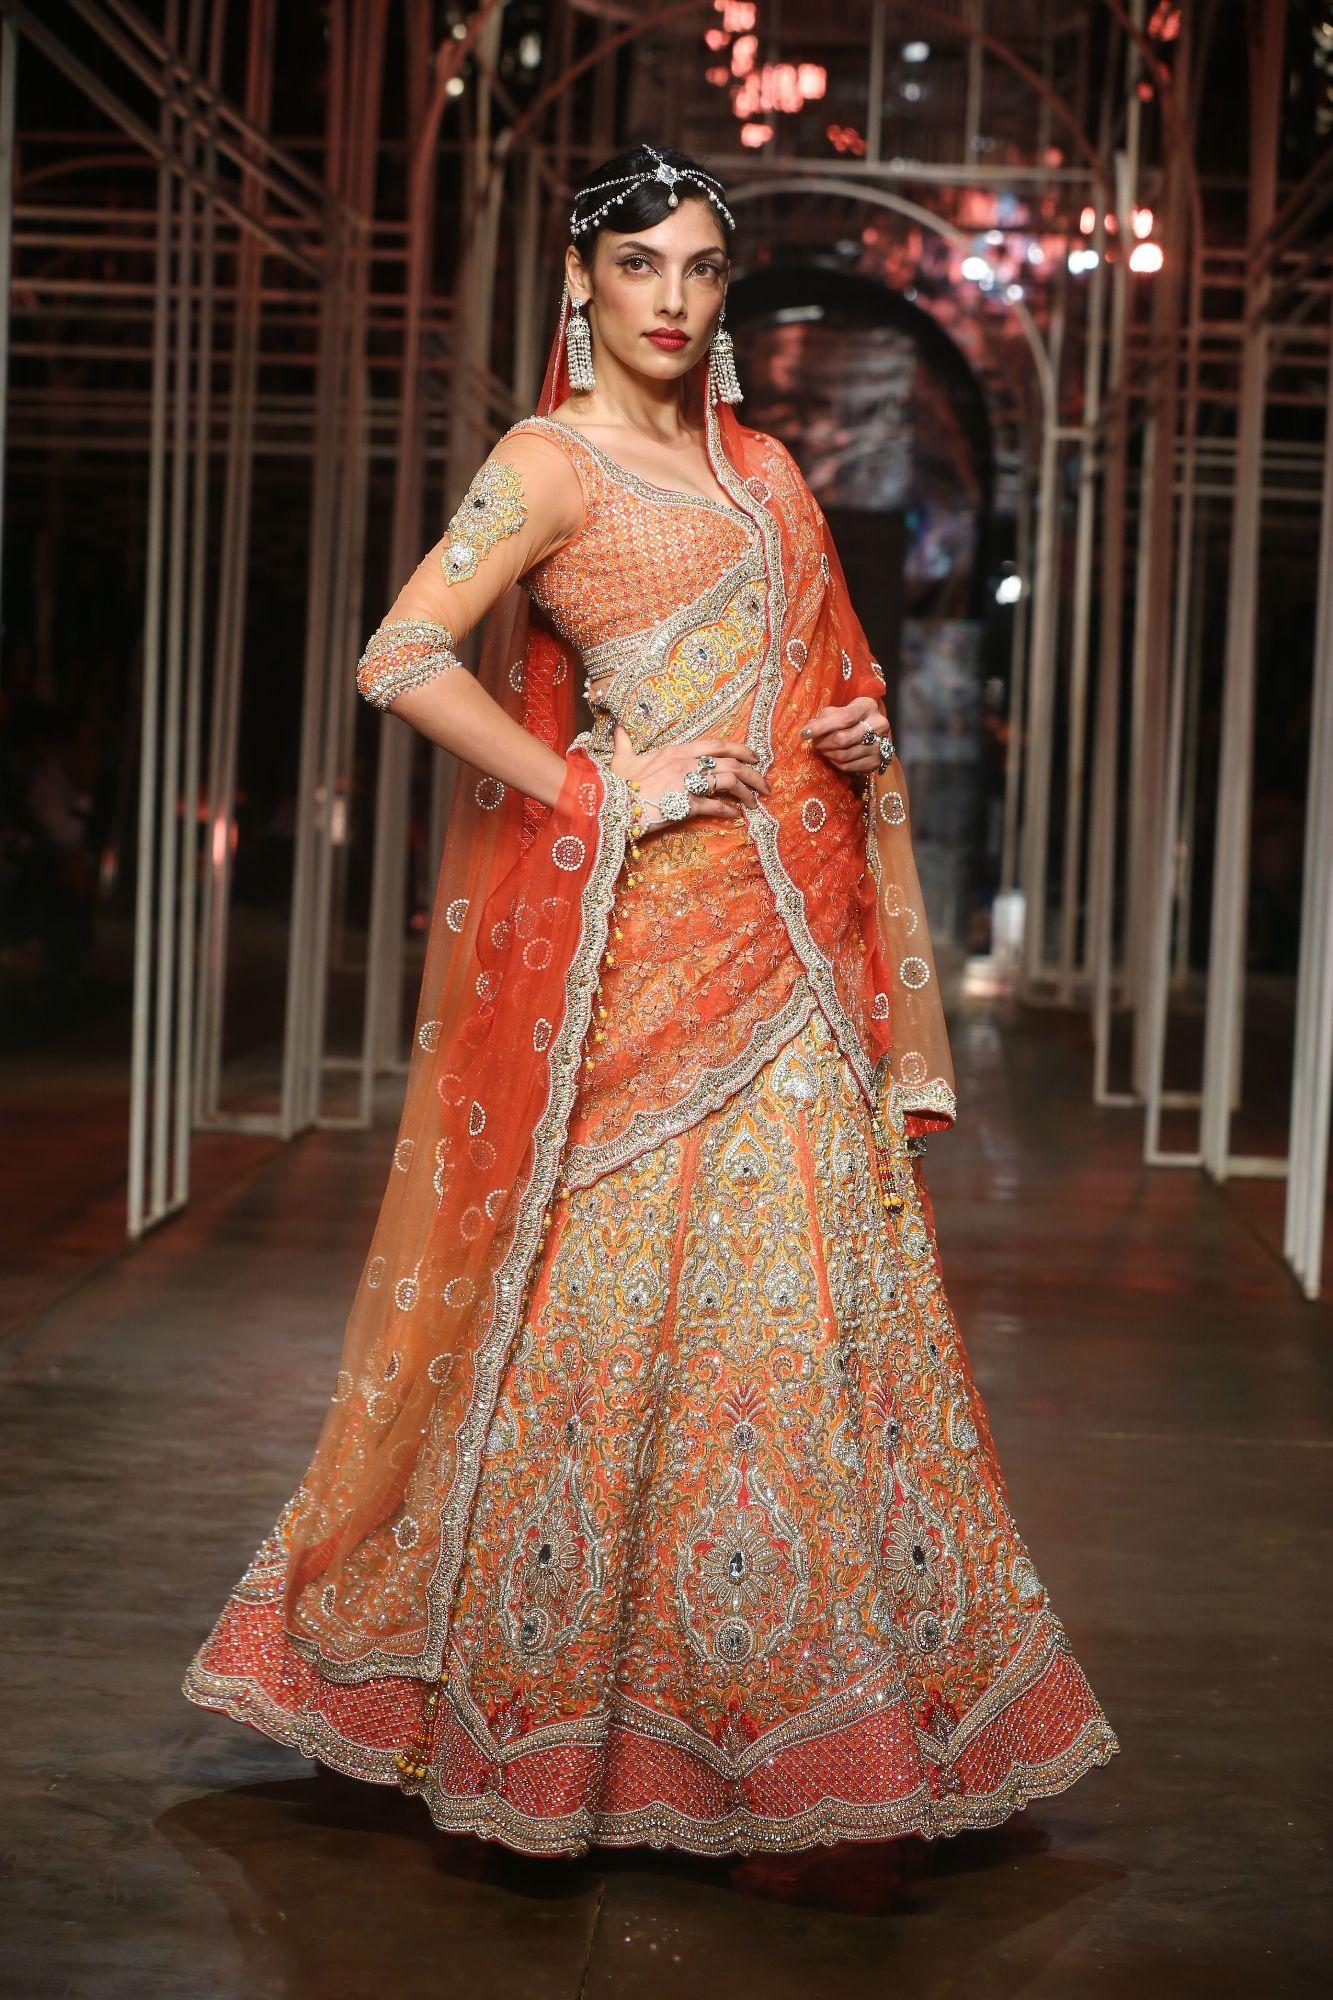 Best dresses to wear to a wedding reception  Best Dress for Wedding Reception  Best Shapewear for Wedding Dress